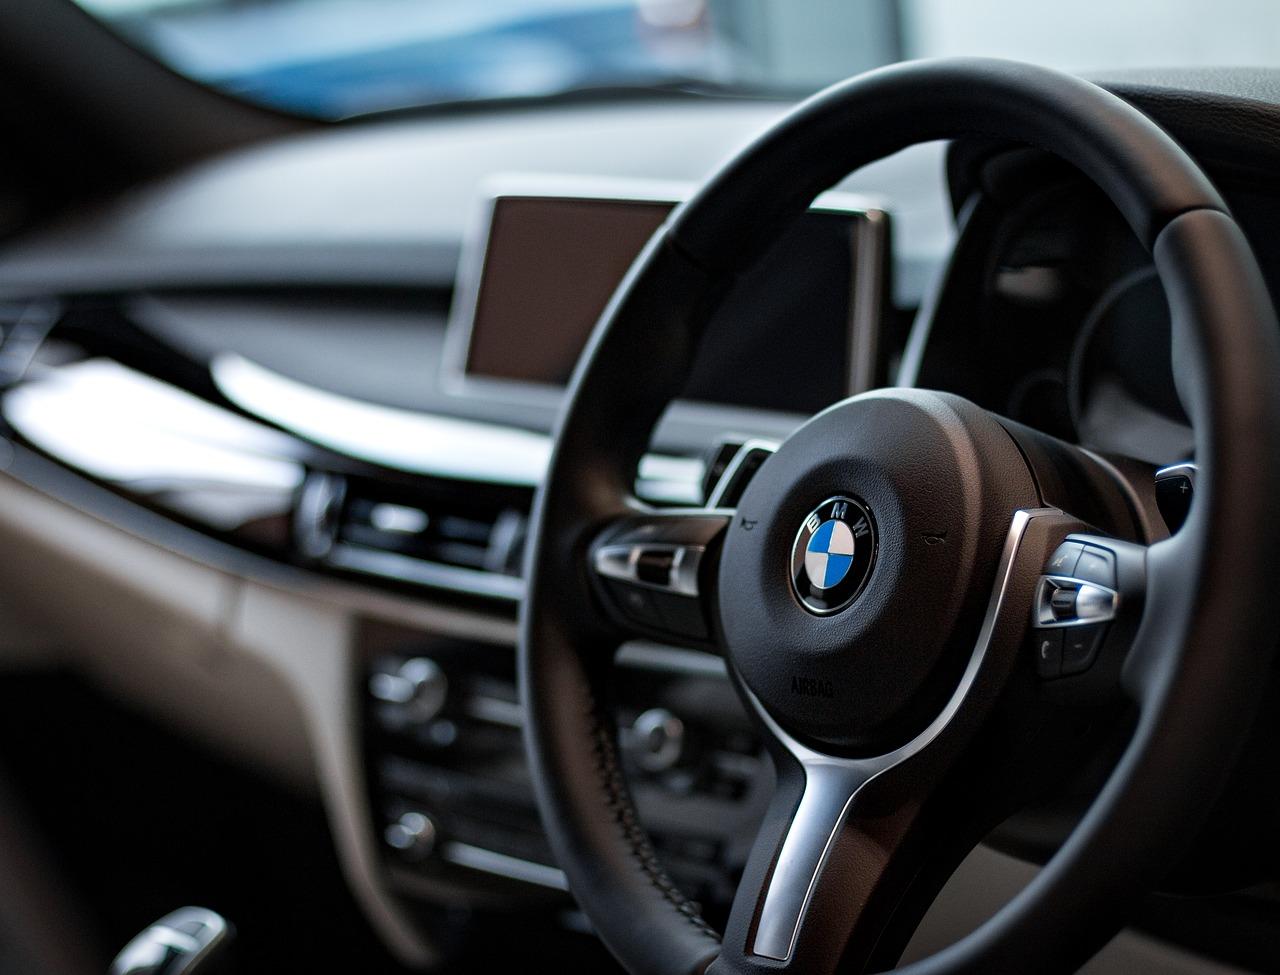 volante-bmw-coolcars-vehiculos-gama-alta